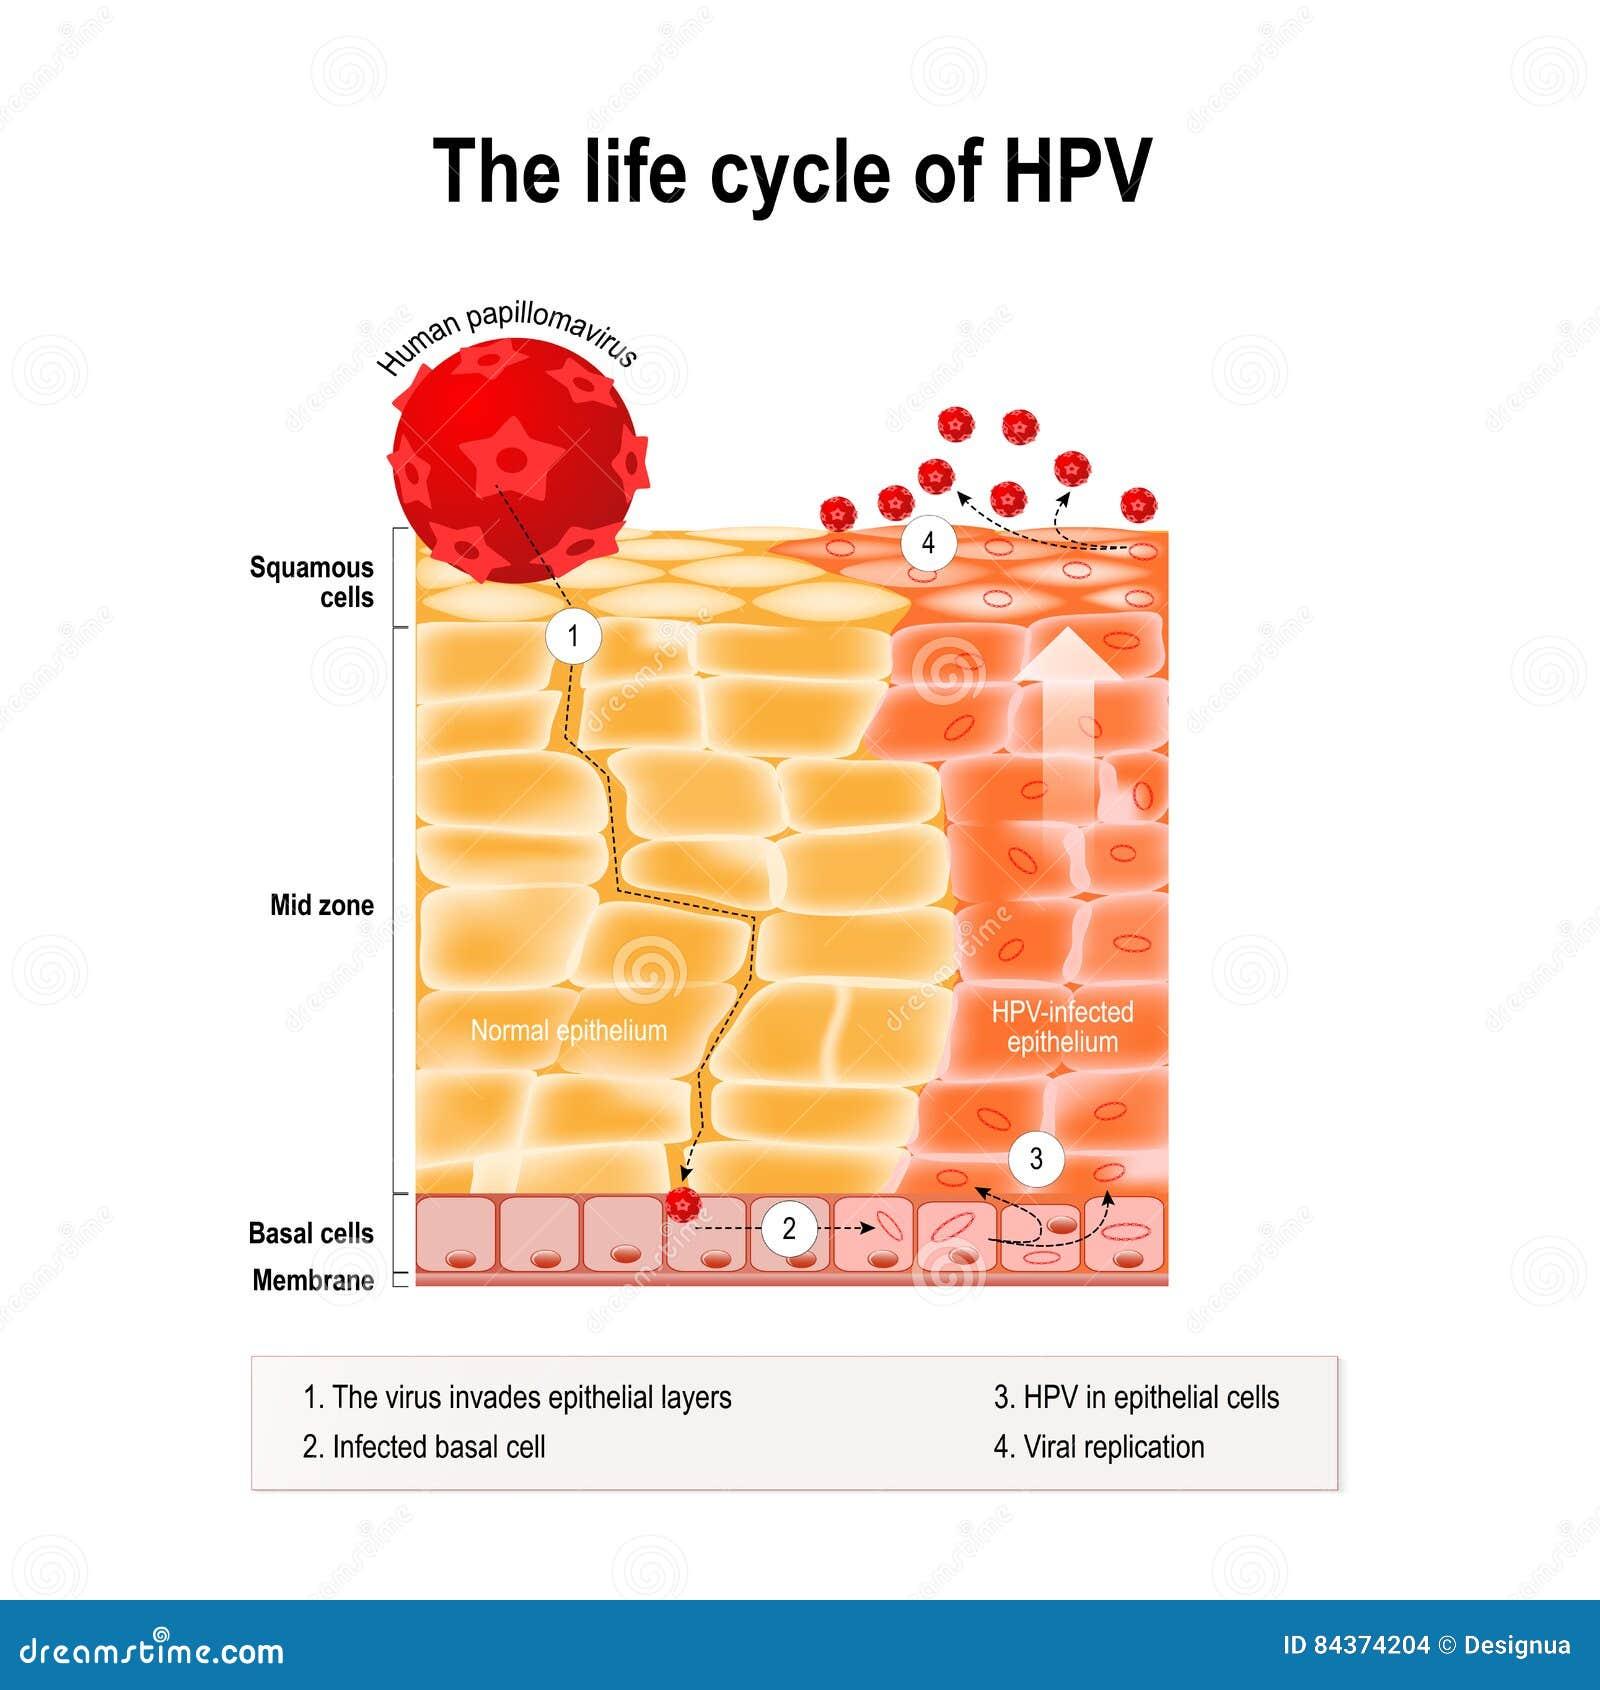 Hpv human papillomavirus symptoms Infectia cu HPV (Human Papilloma Virus)